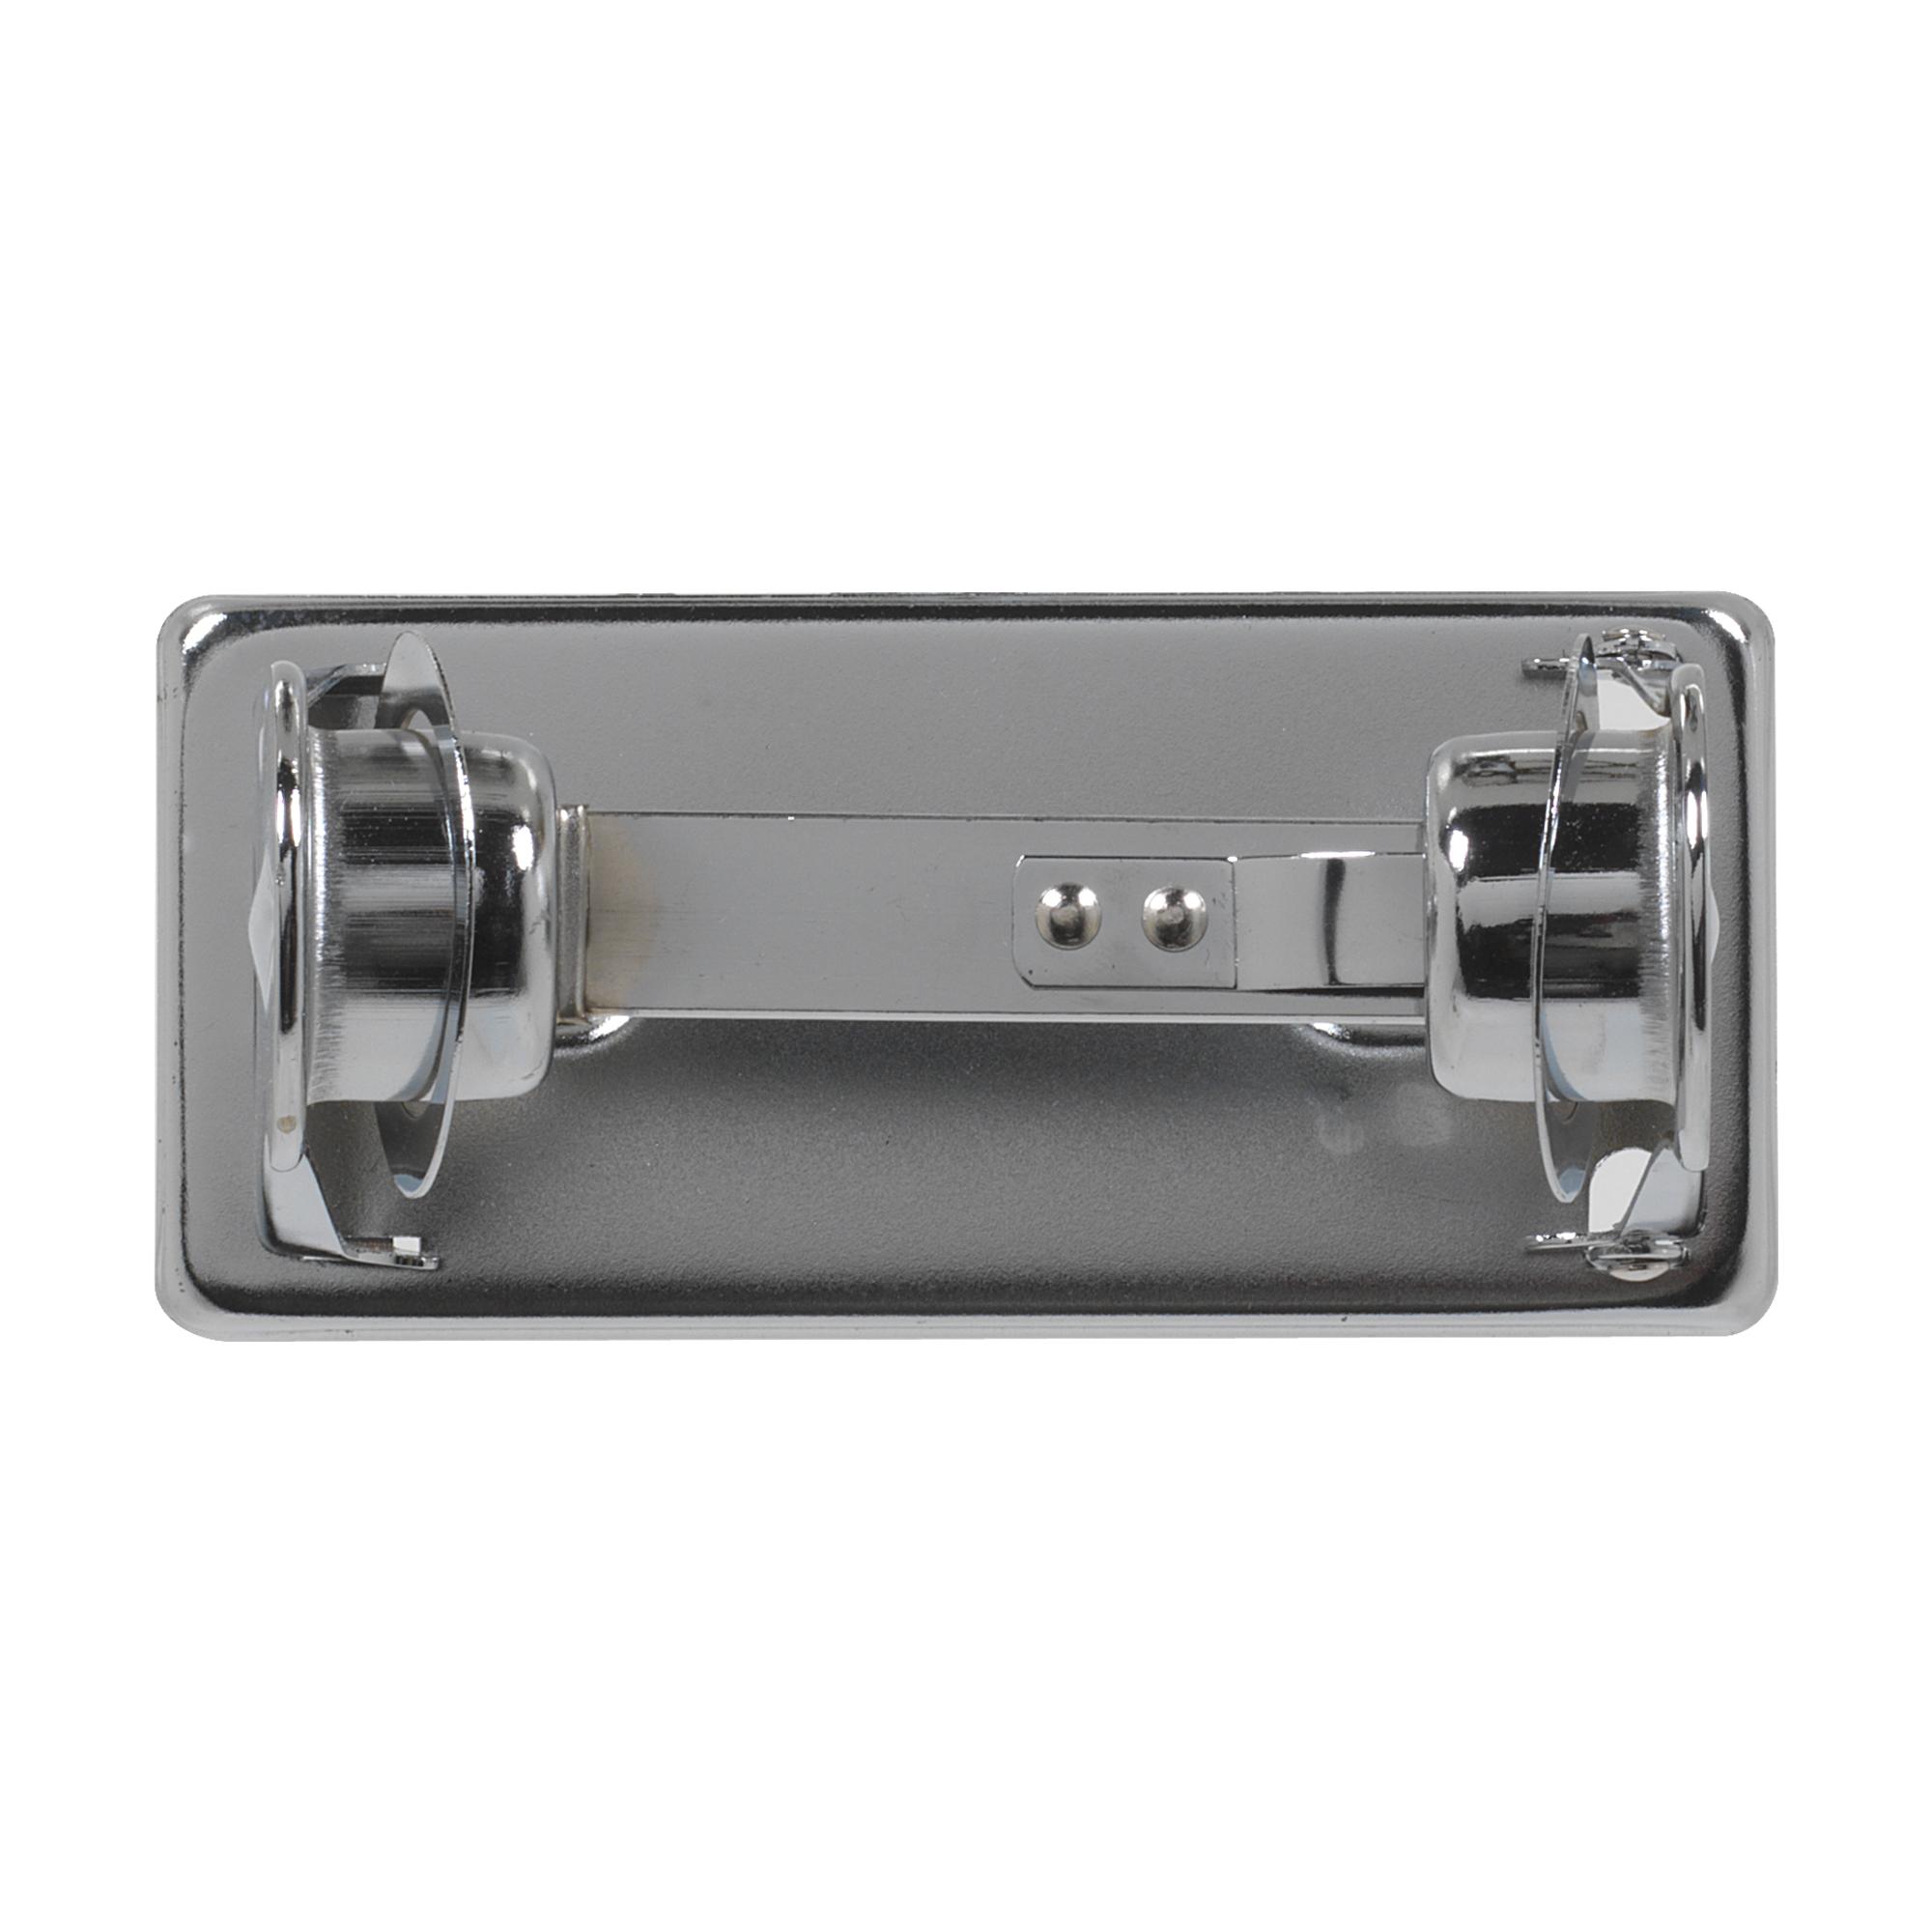 10073310572205 GP Chrome Metal 1-Roll Open Self-Locking Standard Bathroom Tissue Dispenser